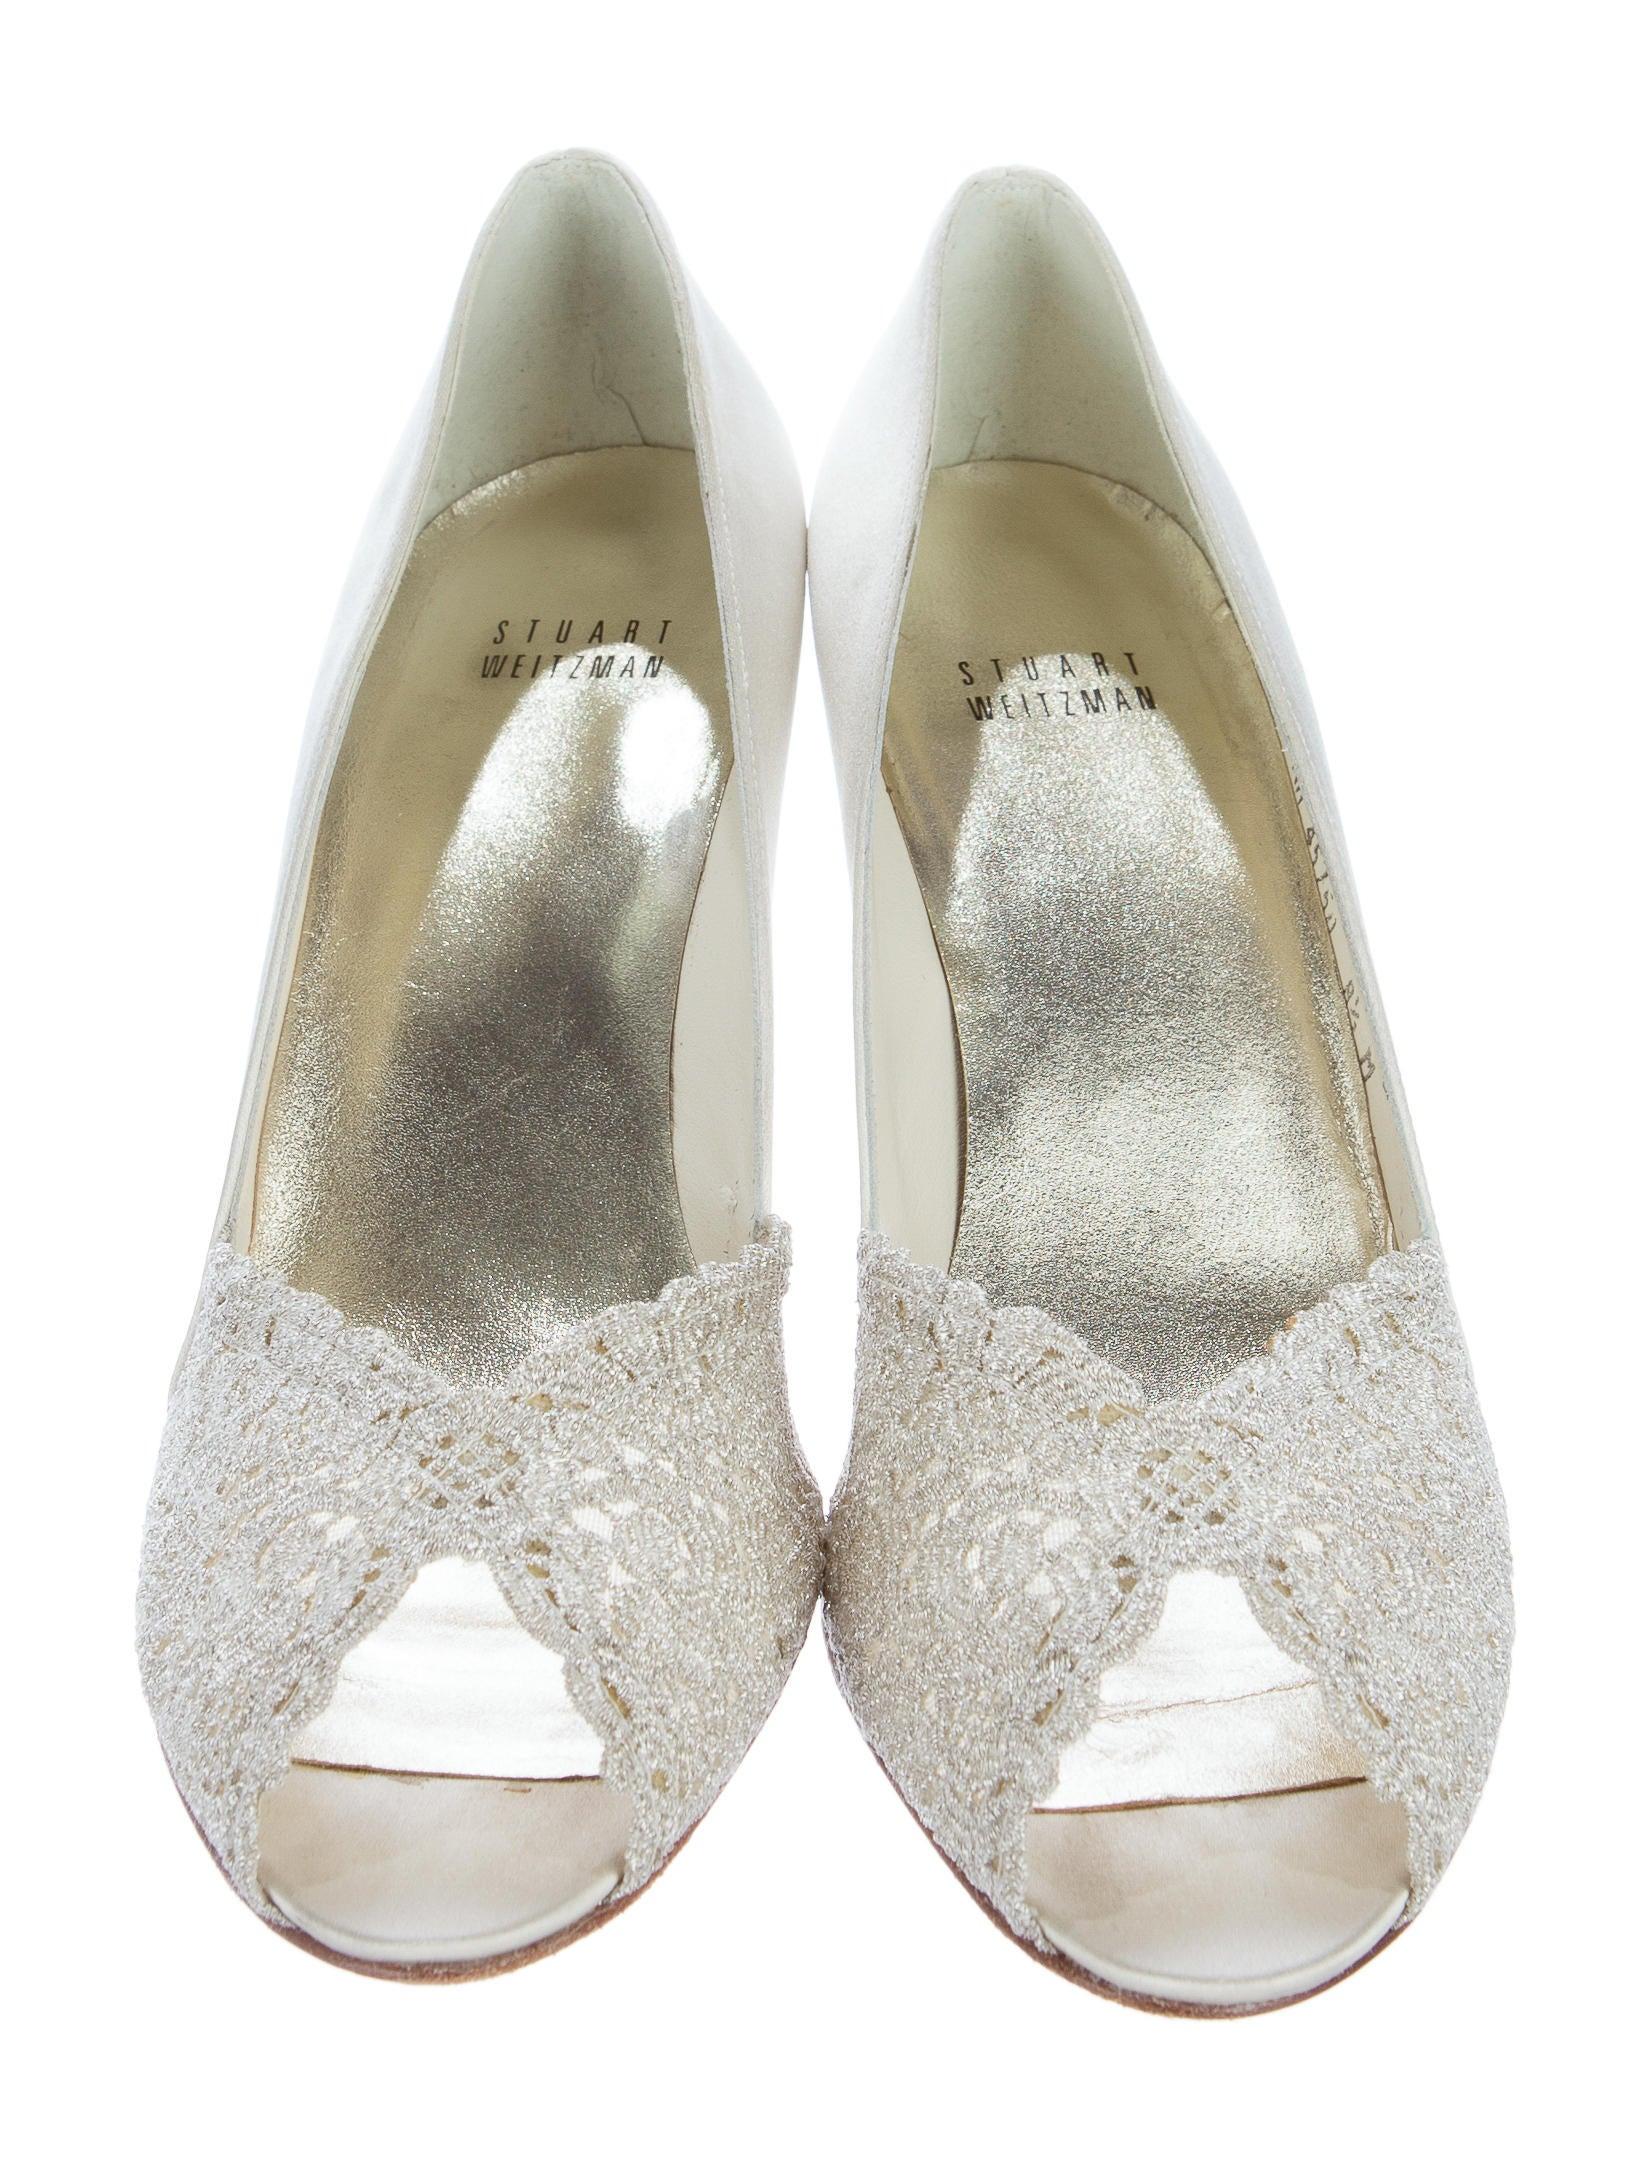 stuart weitzman satin peep toe pumps shoes wsu27029. Black Bedroom Furniture Sets. Home Design Ideas